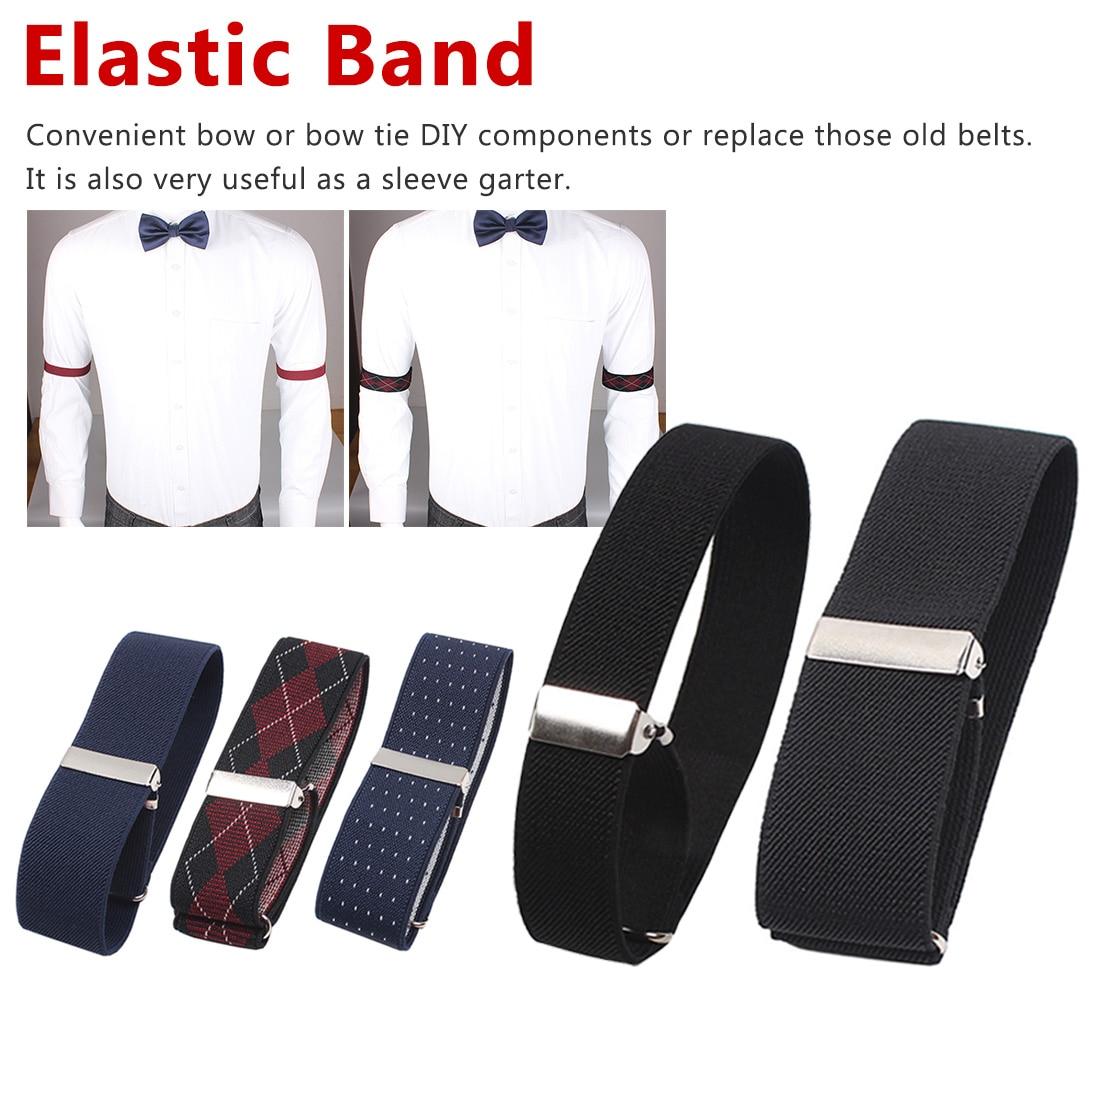 Men's Sleeve Garters Holders Arm Gentleman Bands Sleeve Shirt Groom Elastic Garter Metal Bracelet